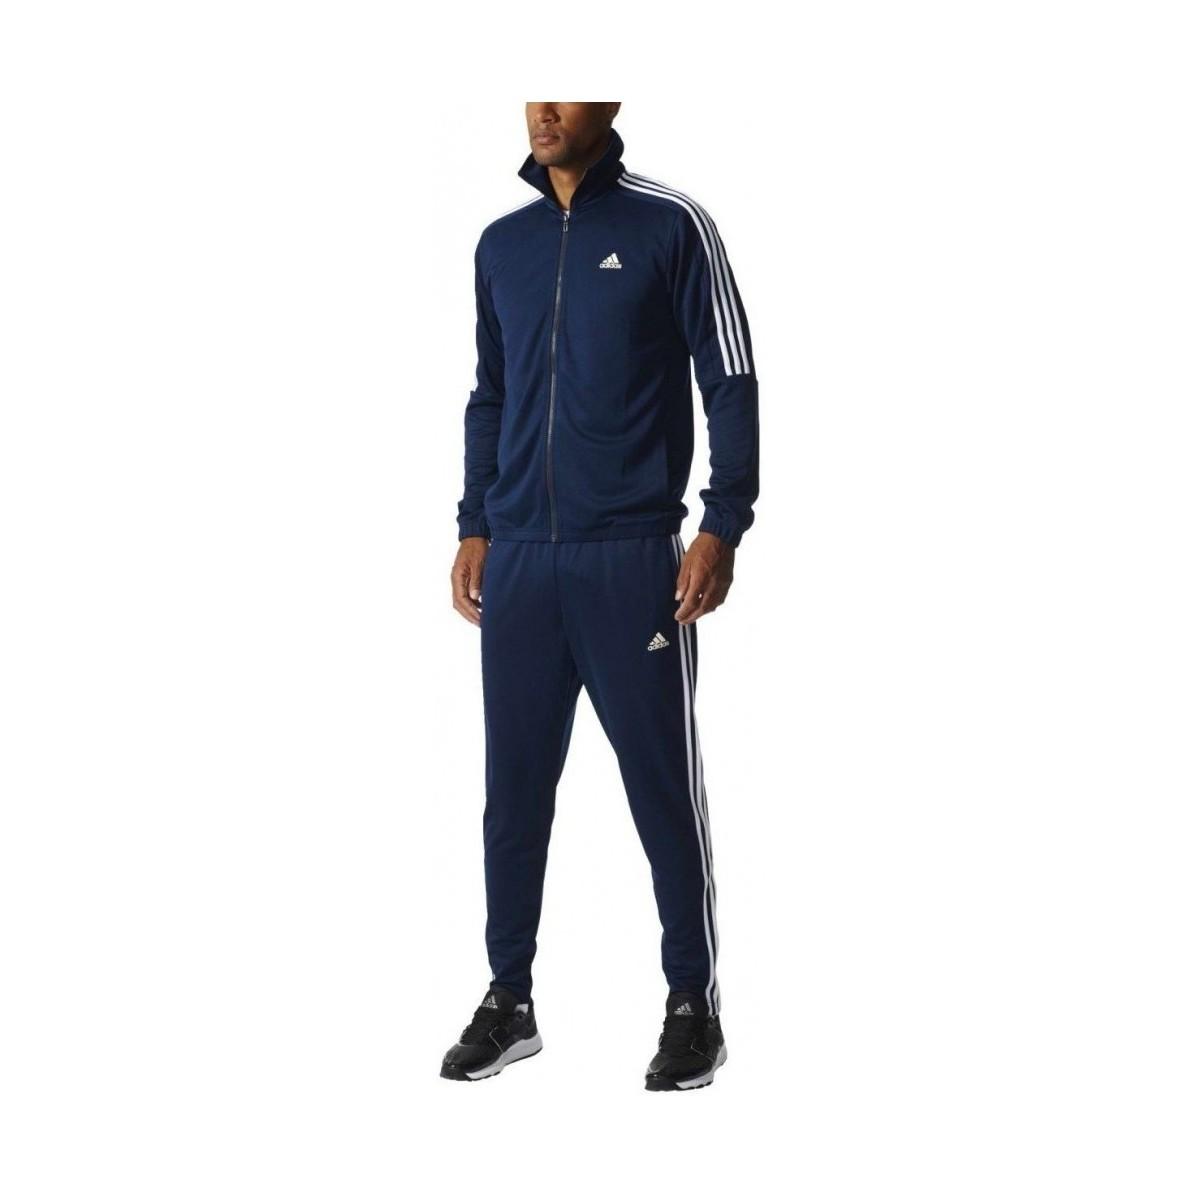 adidas jogging homme